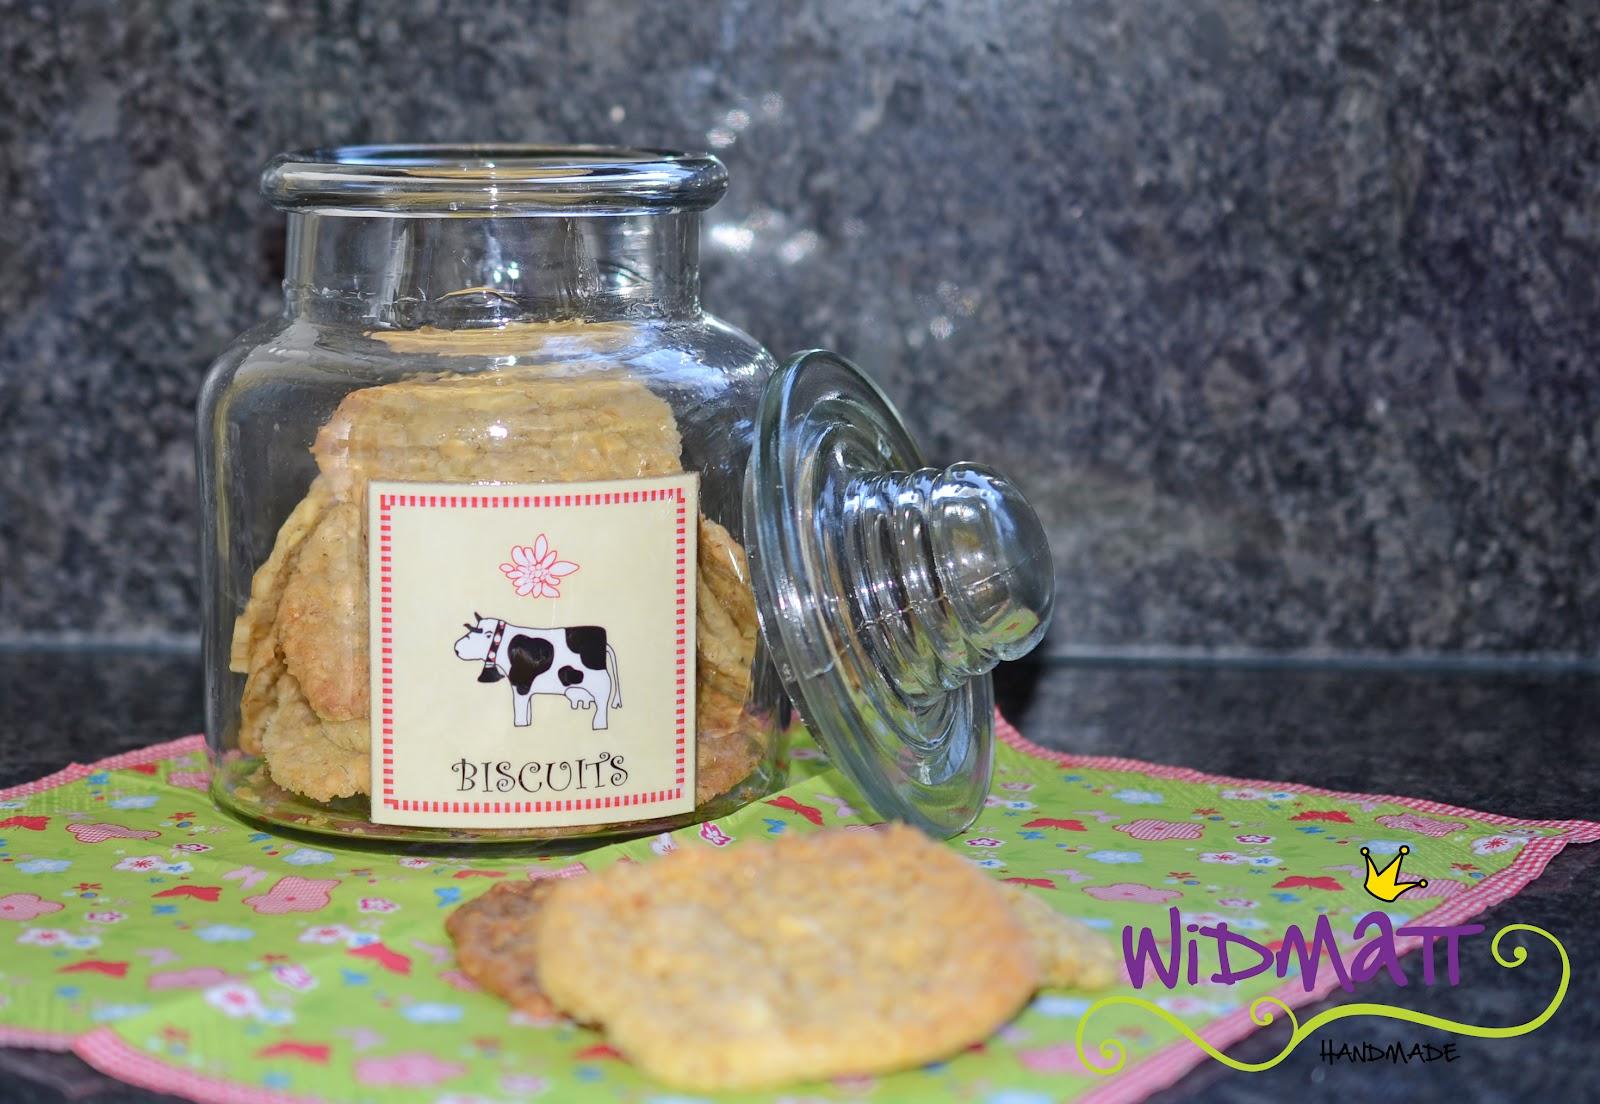 widmatt.ch Cookies mit weisser Schokolade